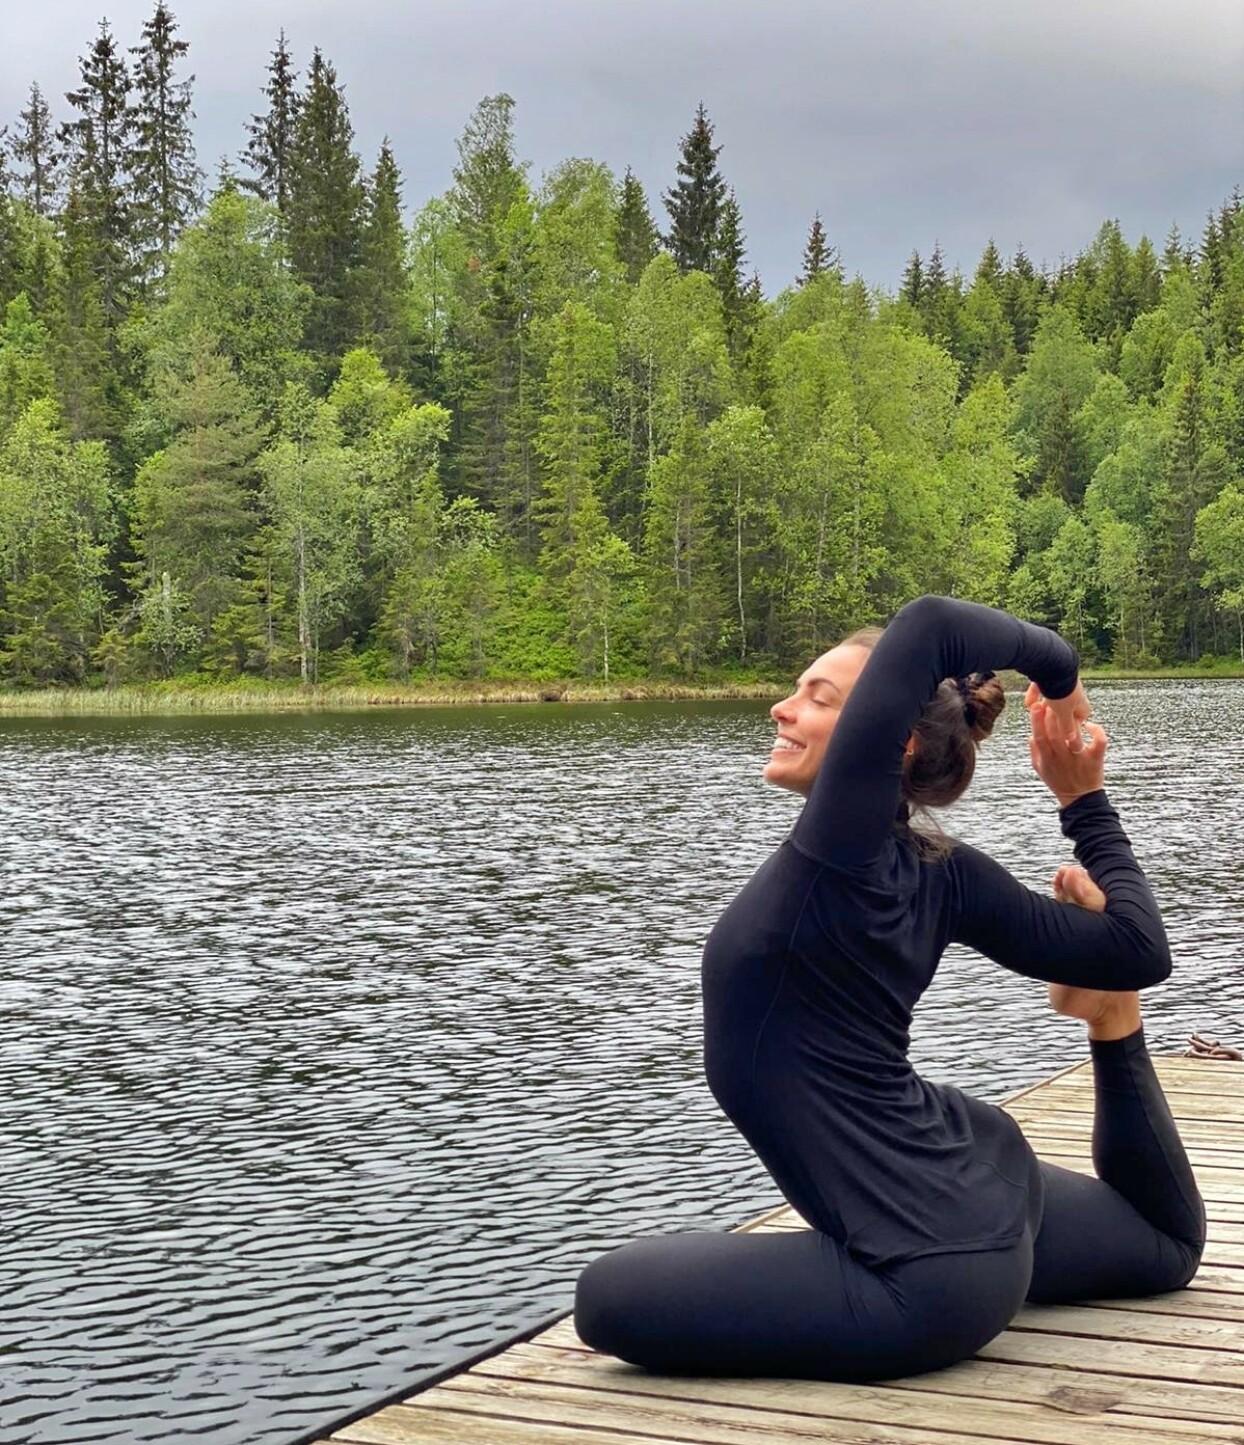 <strong>SKOGSYOGA:</strong> Francesca Golfetto står for yogatimene. FOTO: Privat